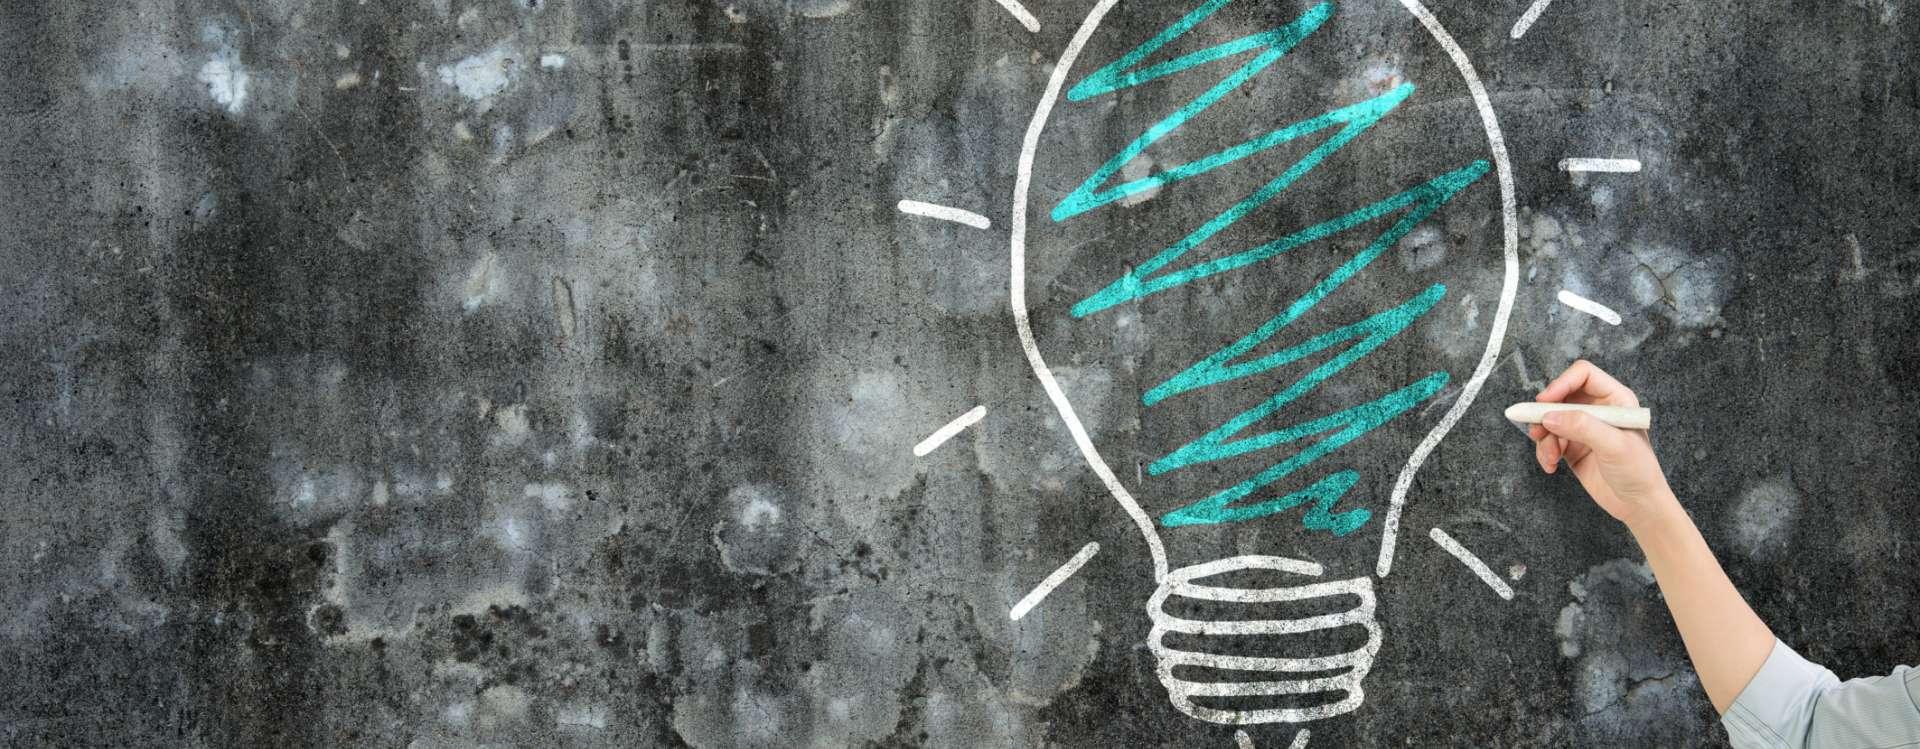 Euréka : la boîte à idée de l'innovation GA